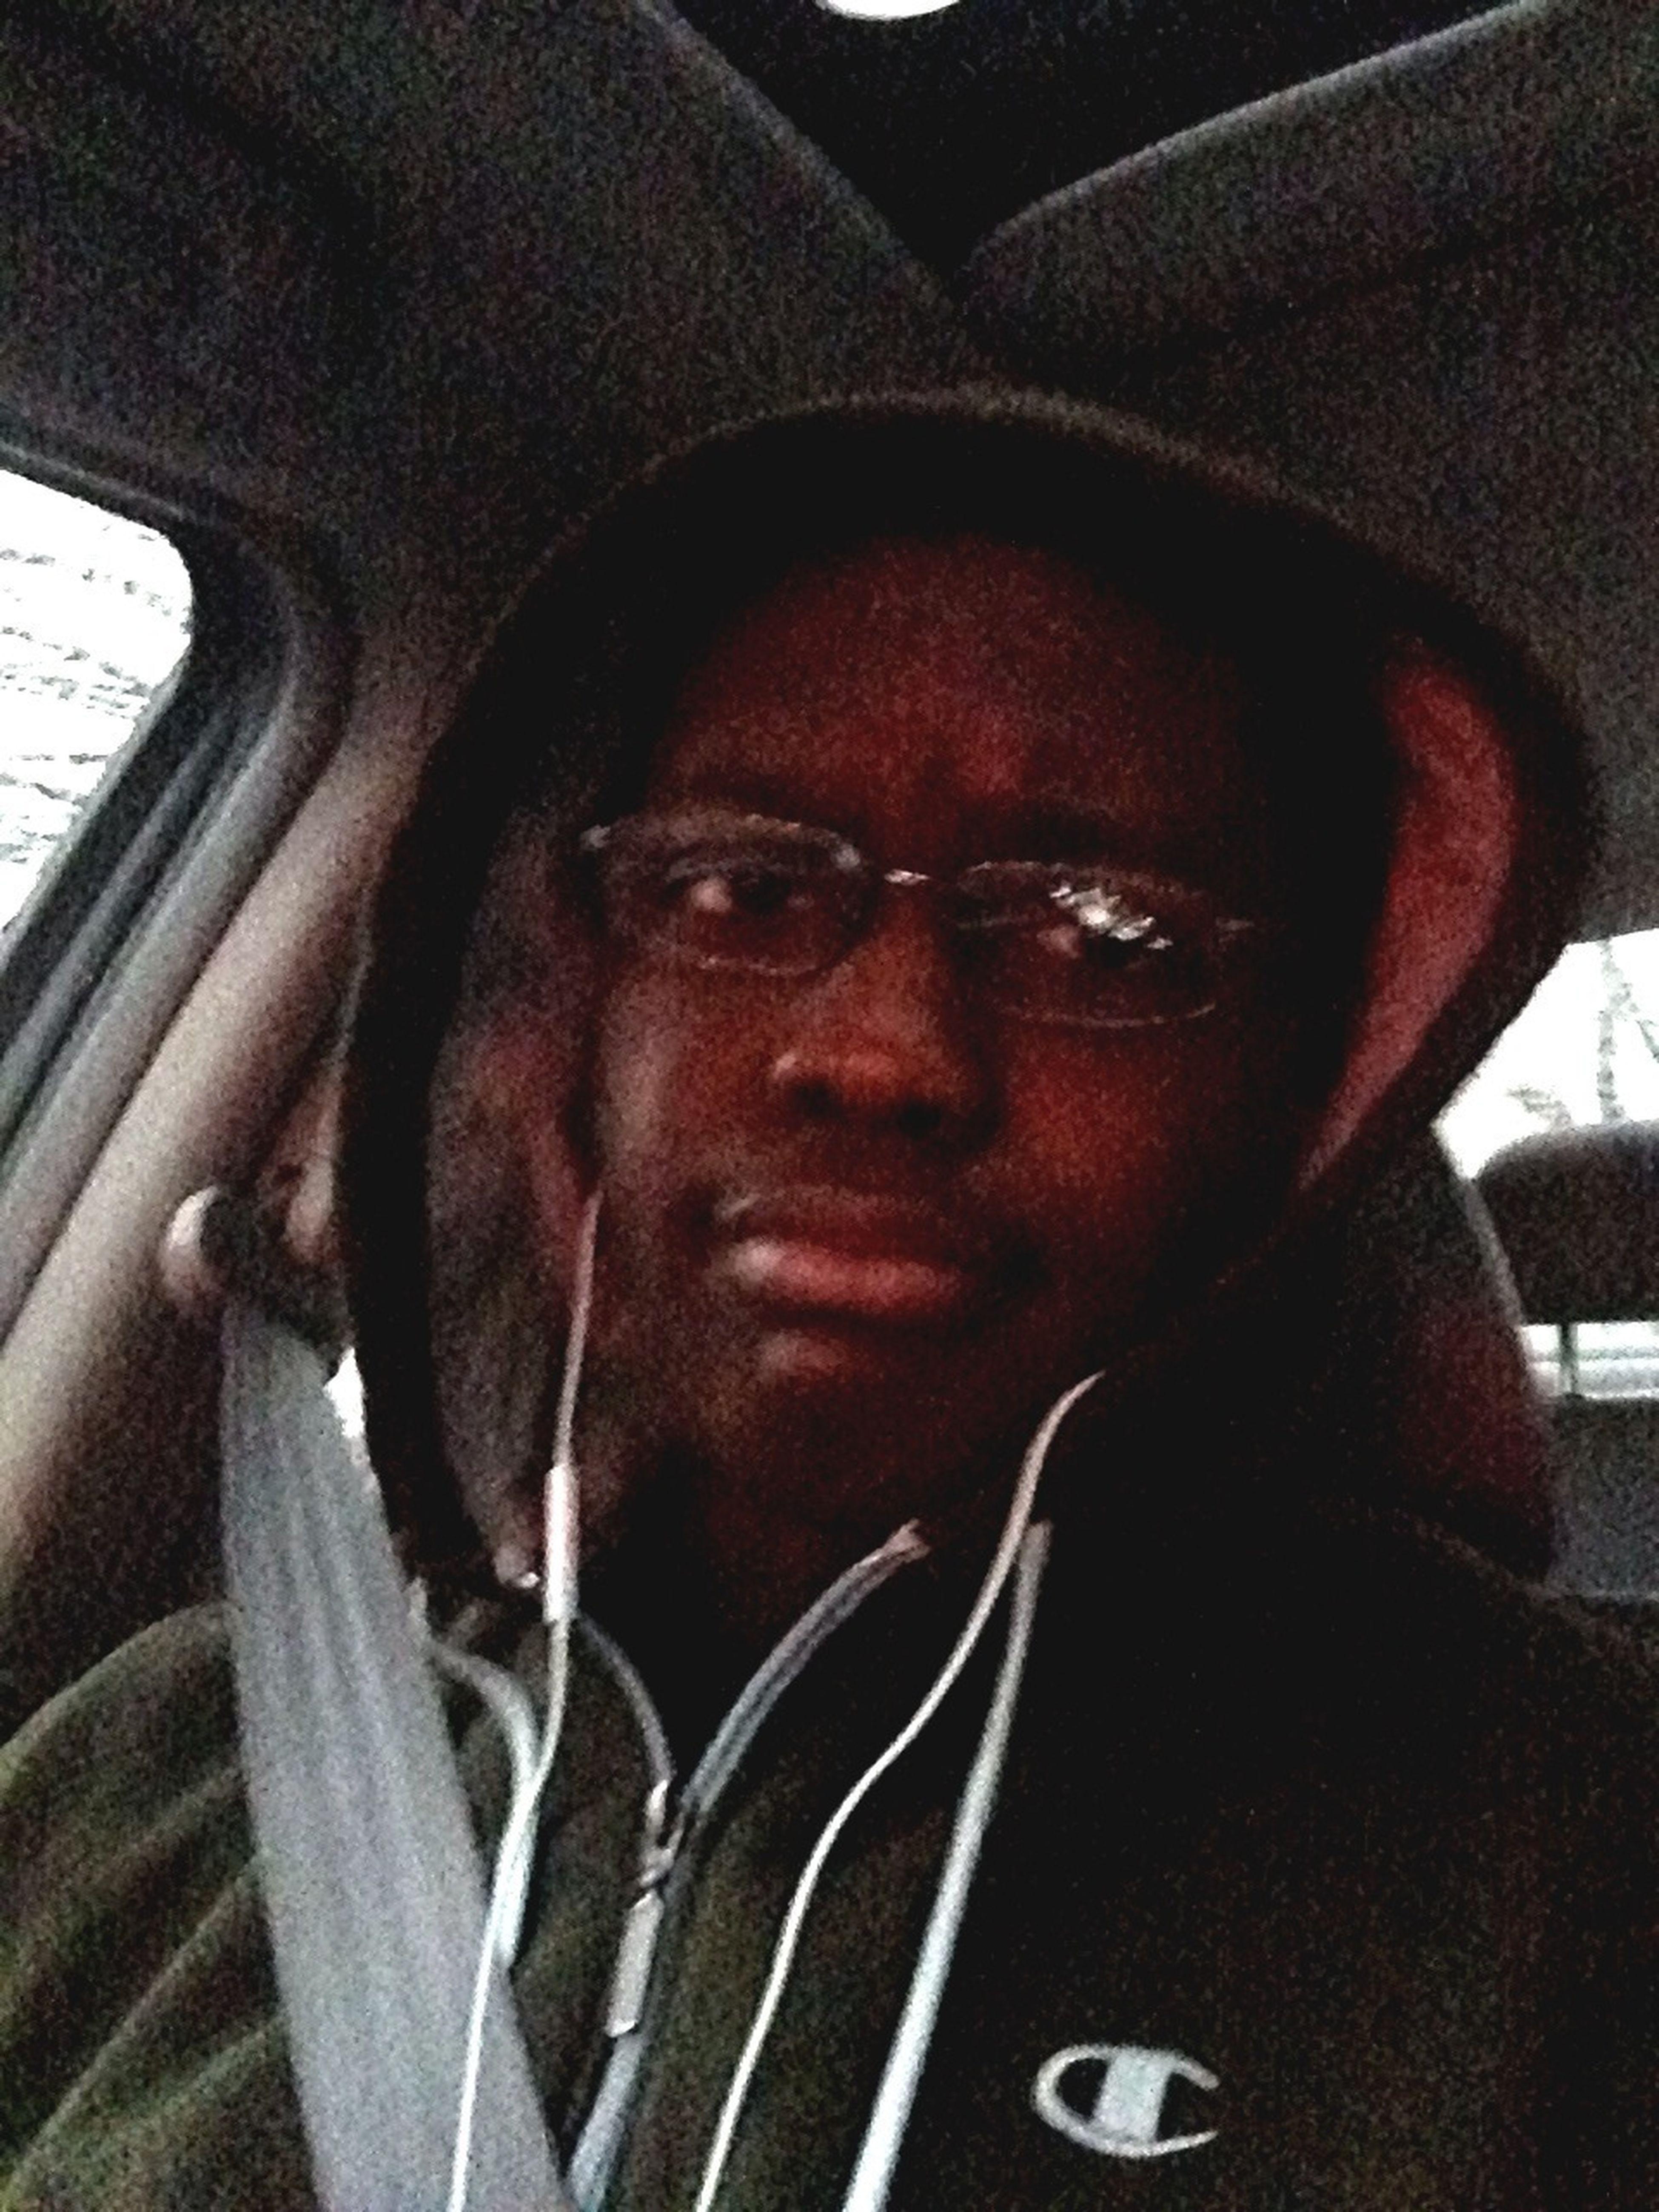 On My Way To School